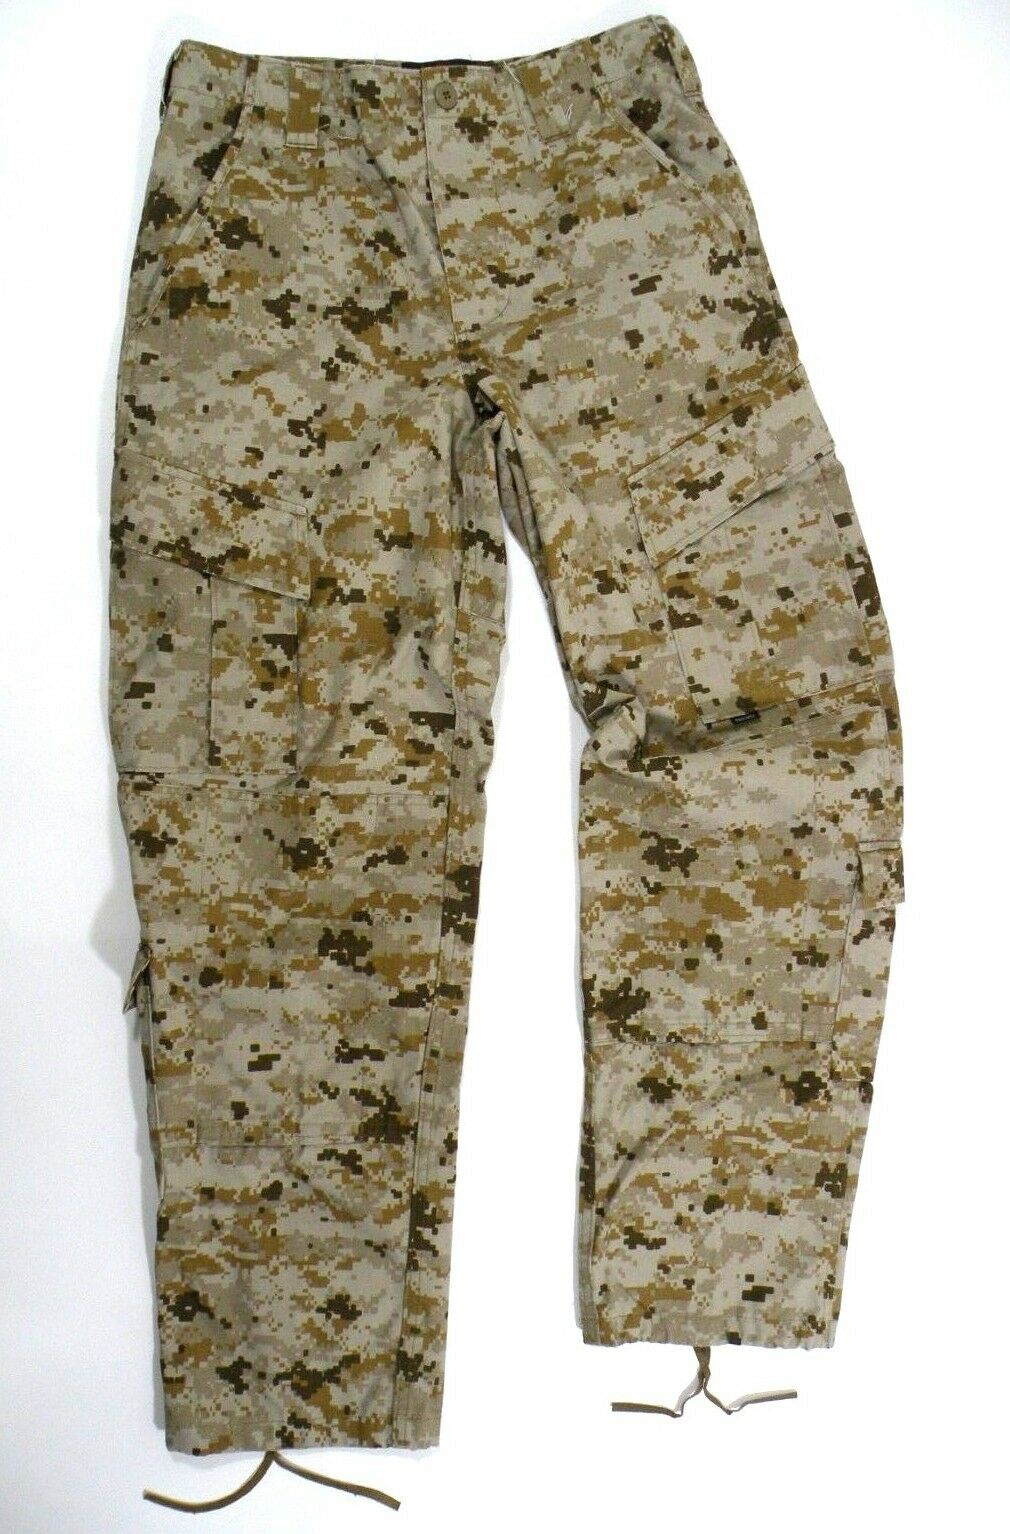 Tru-Spec 1293 Tactical Response Uniform (TRU) Pants Desert Digital Small Regular